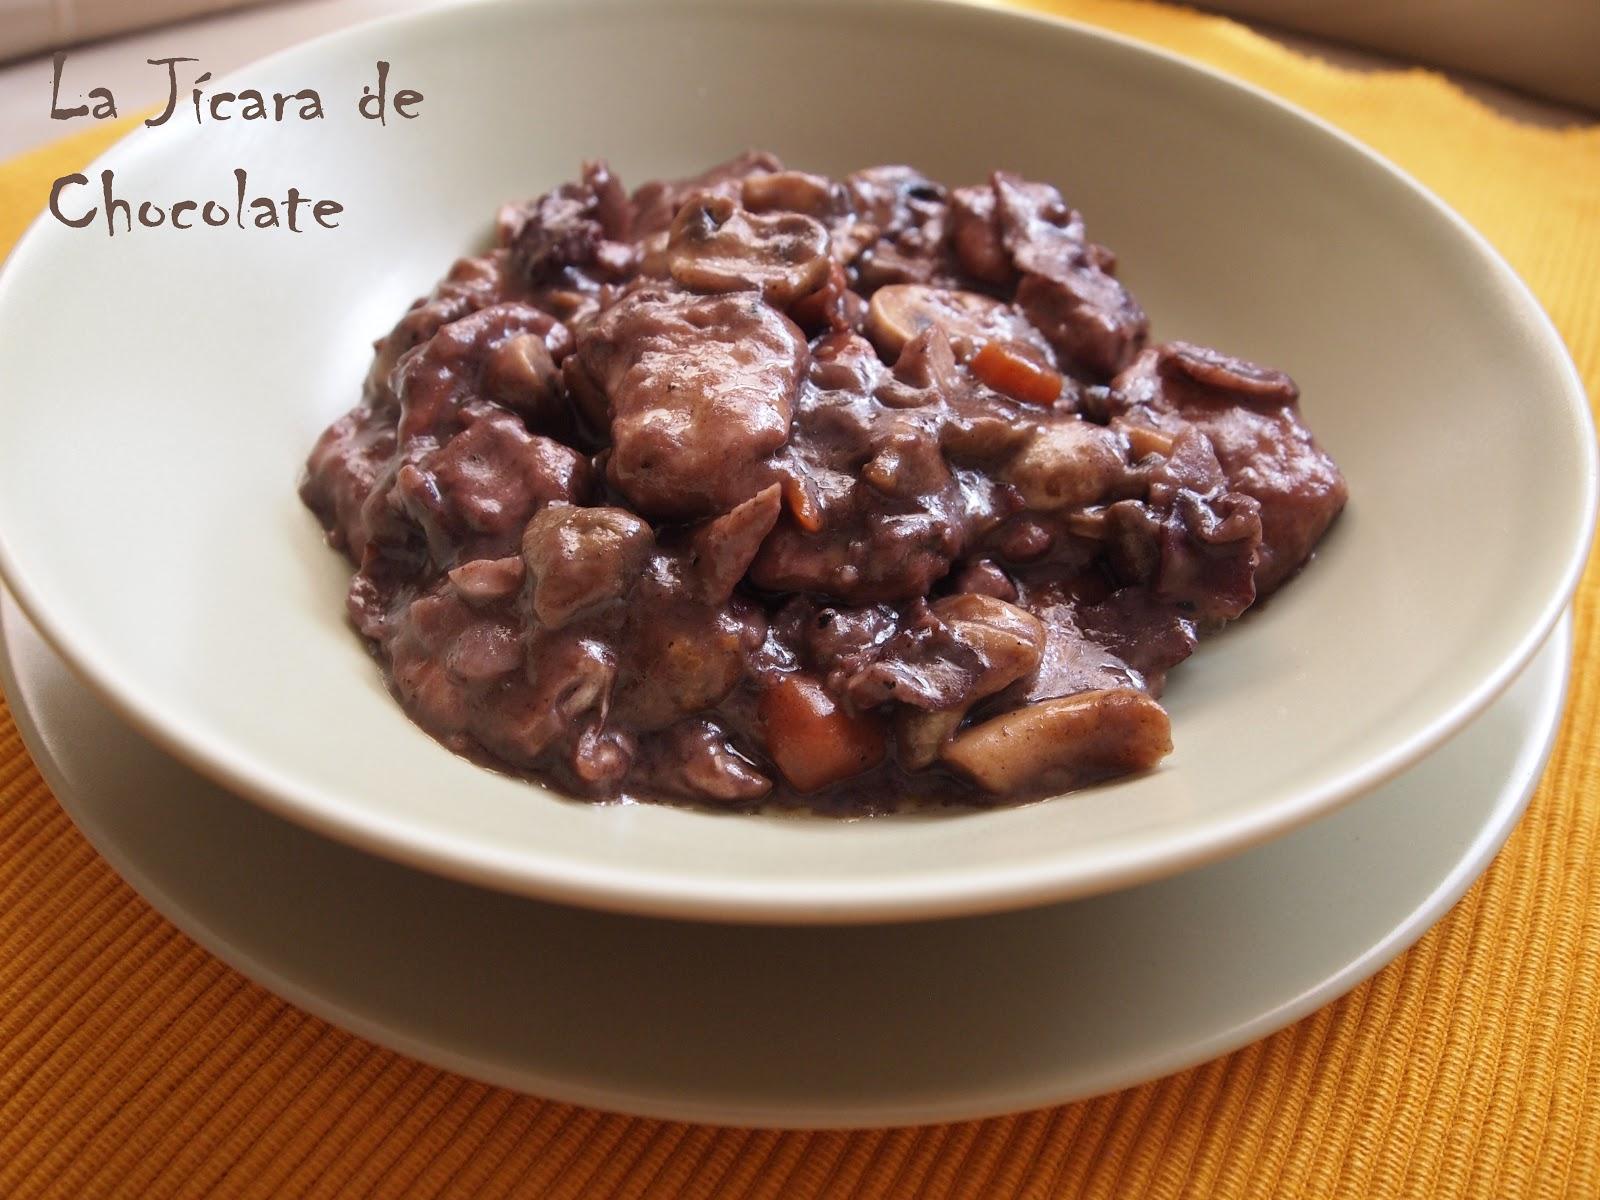 La Jícara de Chocolate: Coq au Vin o Pollo al Vino